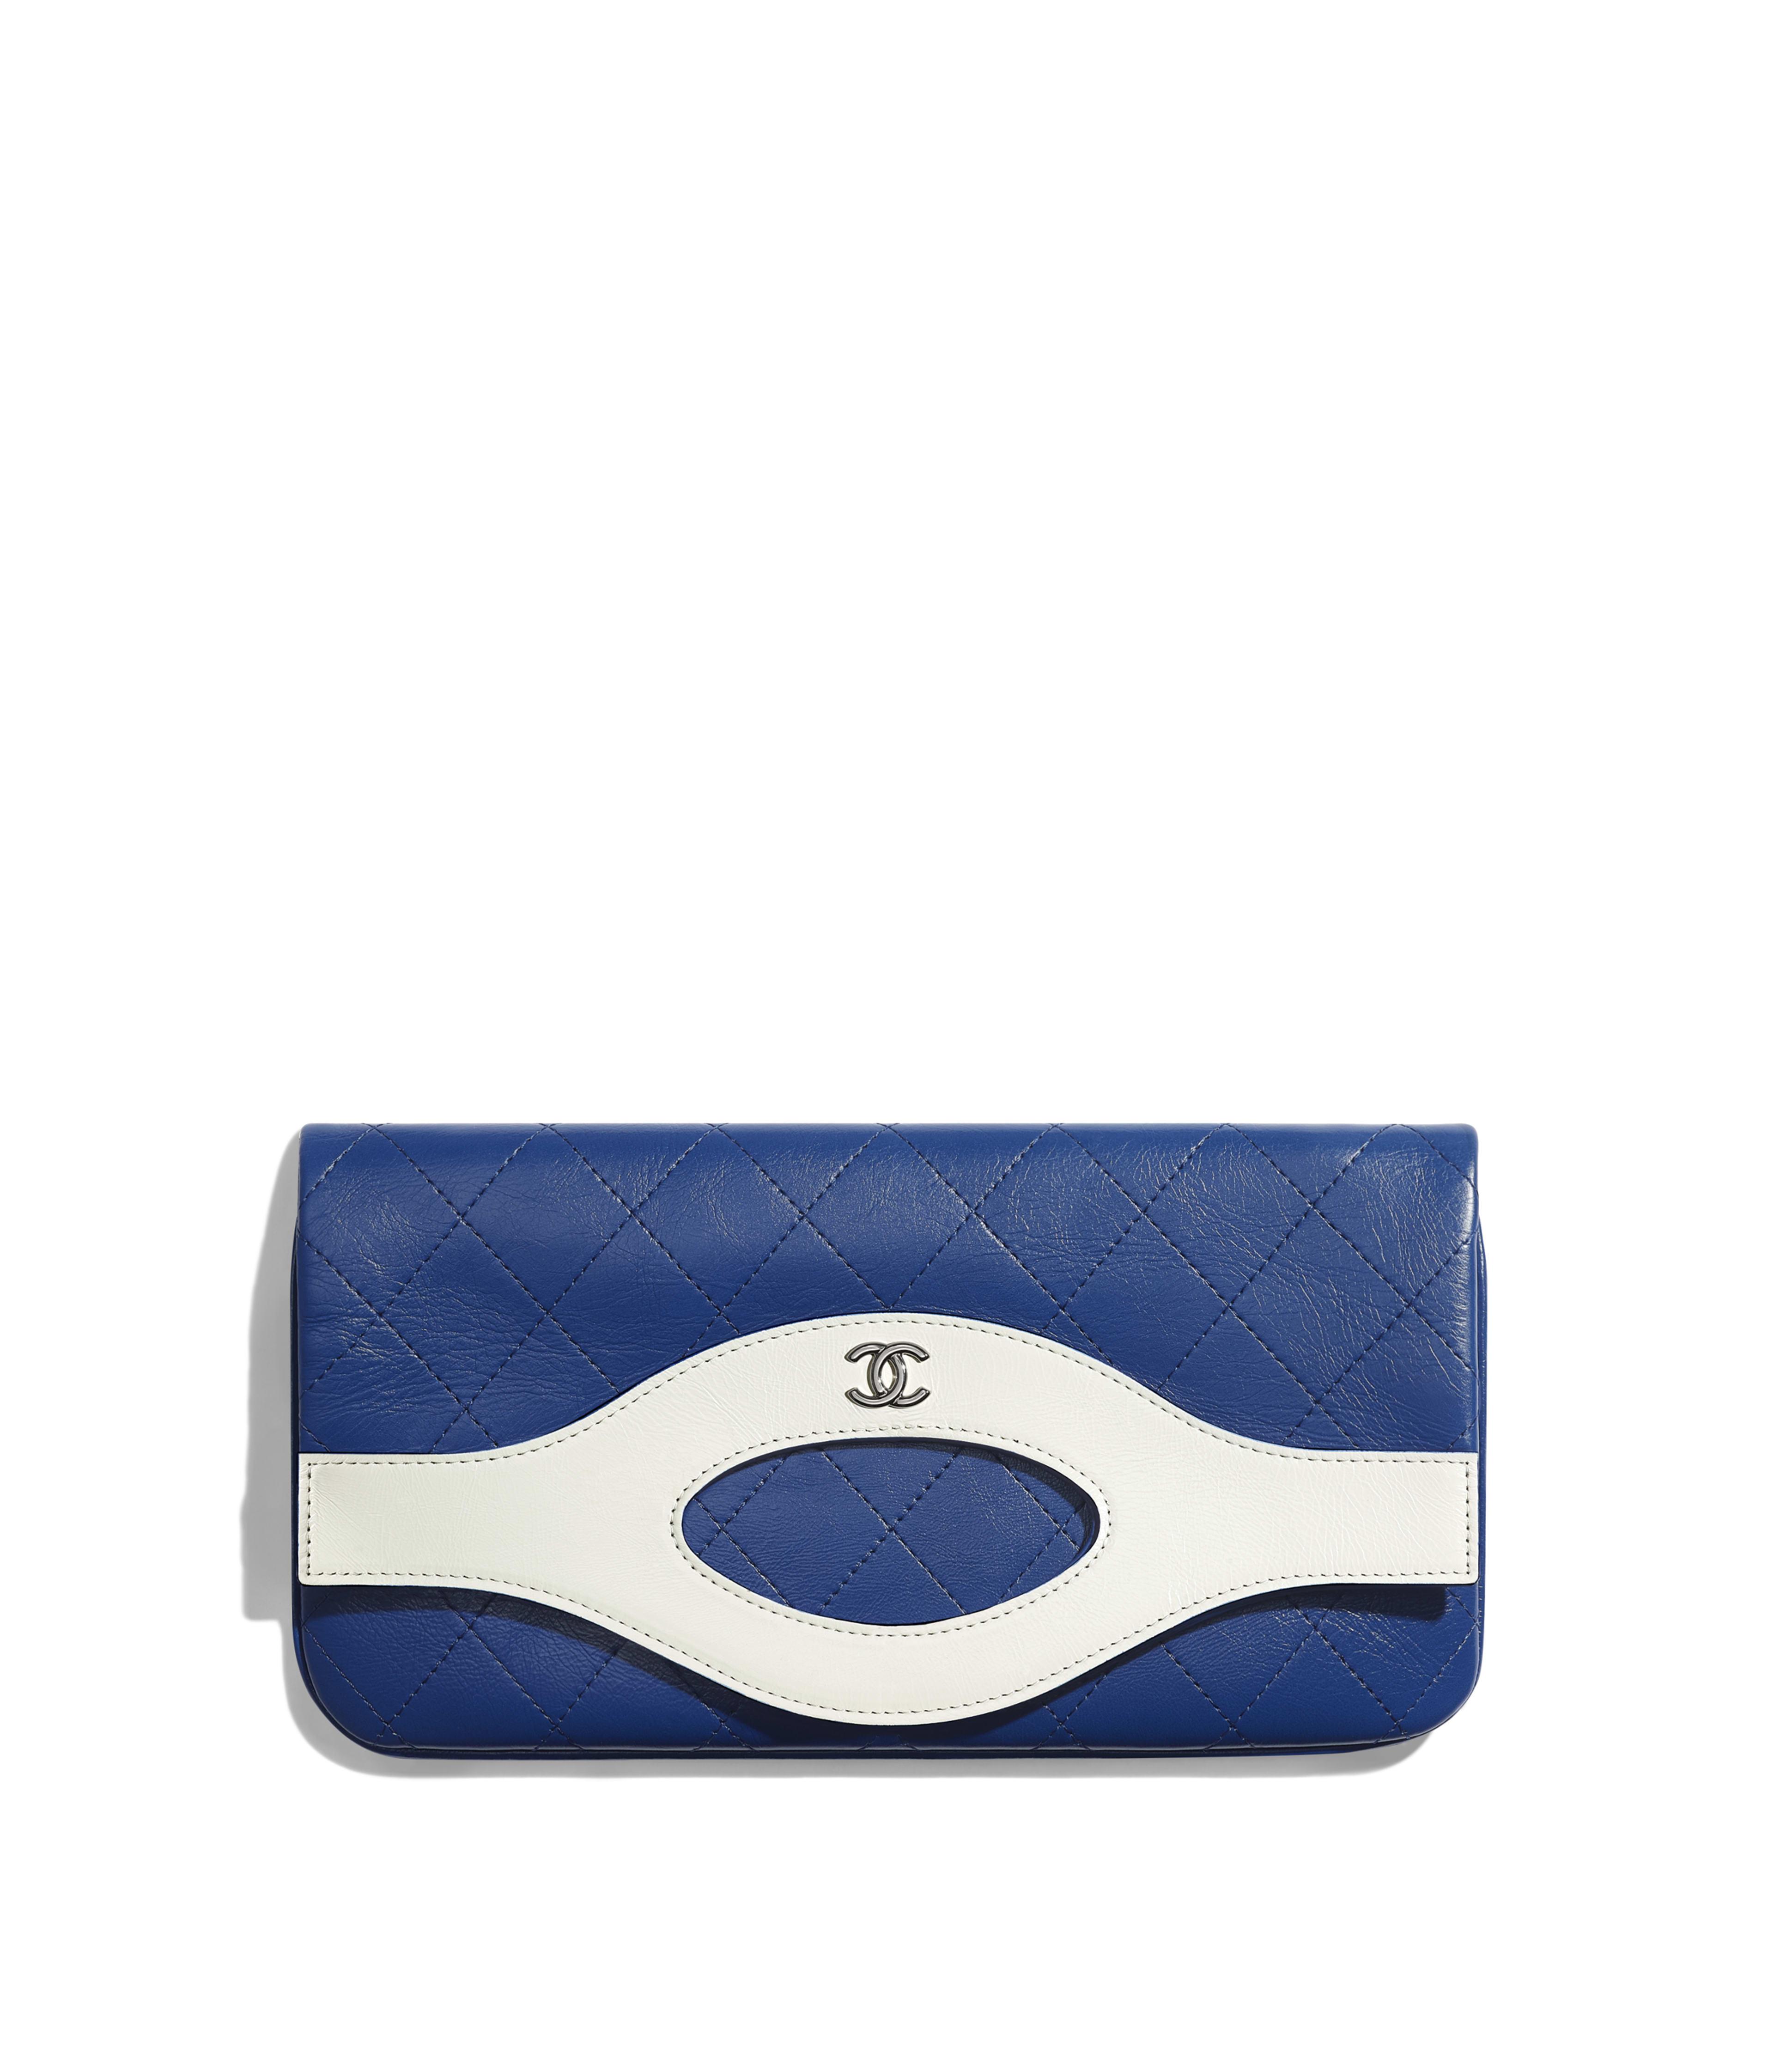 Chanel 31 Pouch Aged Calfskin Silver Tone Metal Blue White Ref A70520y33424c3315